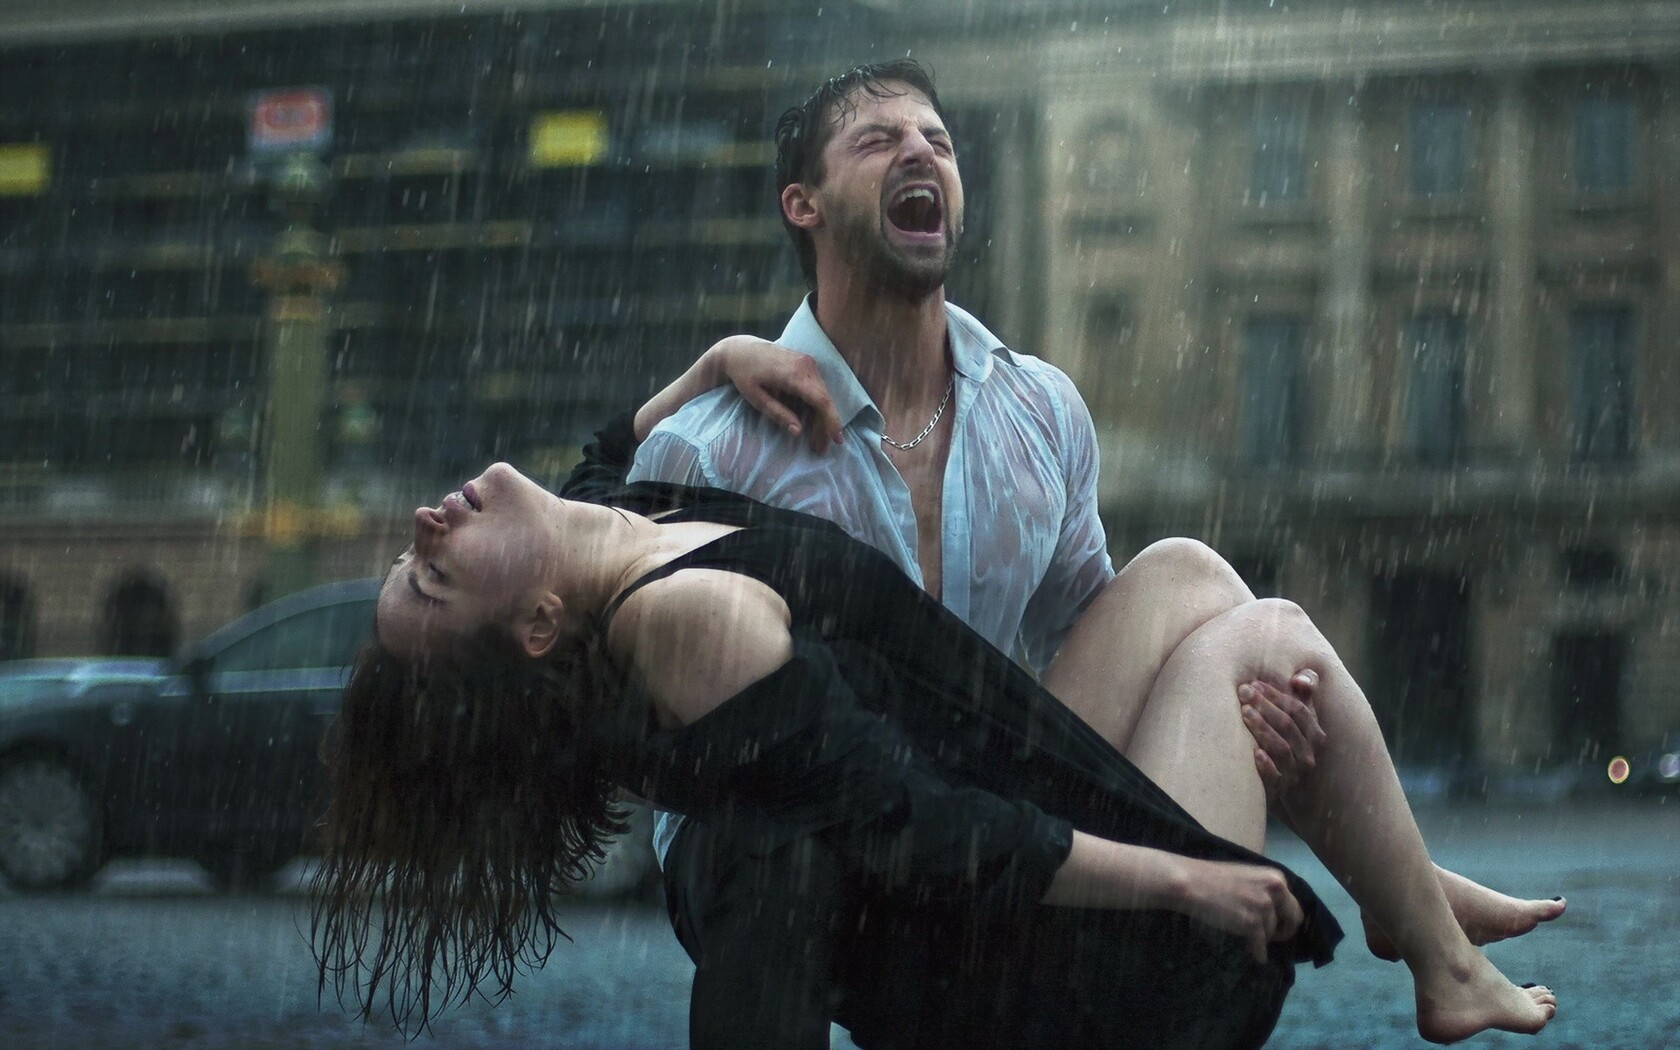 boy-crying-in-rain-pic.jpg